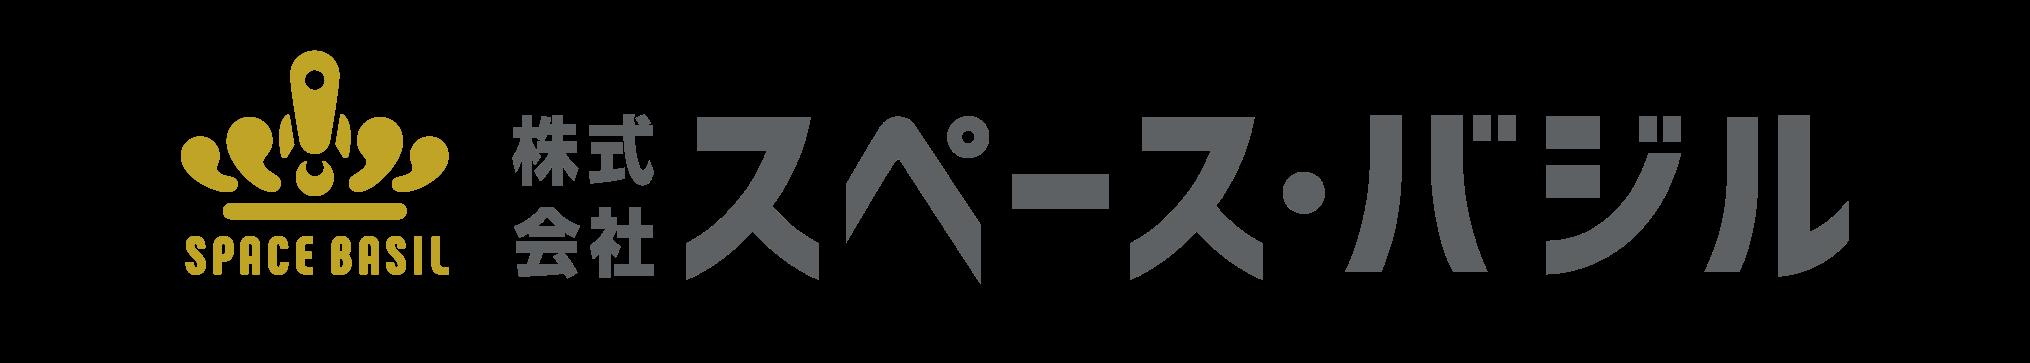 space vasil logo date-03